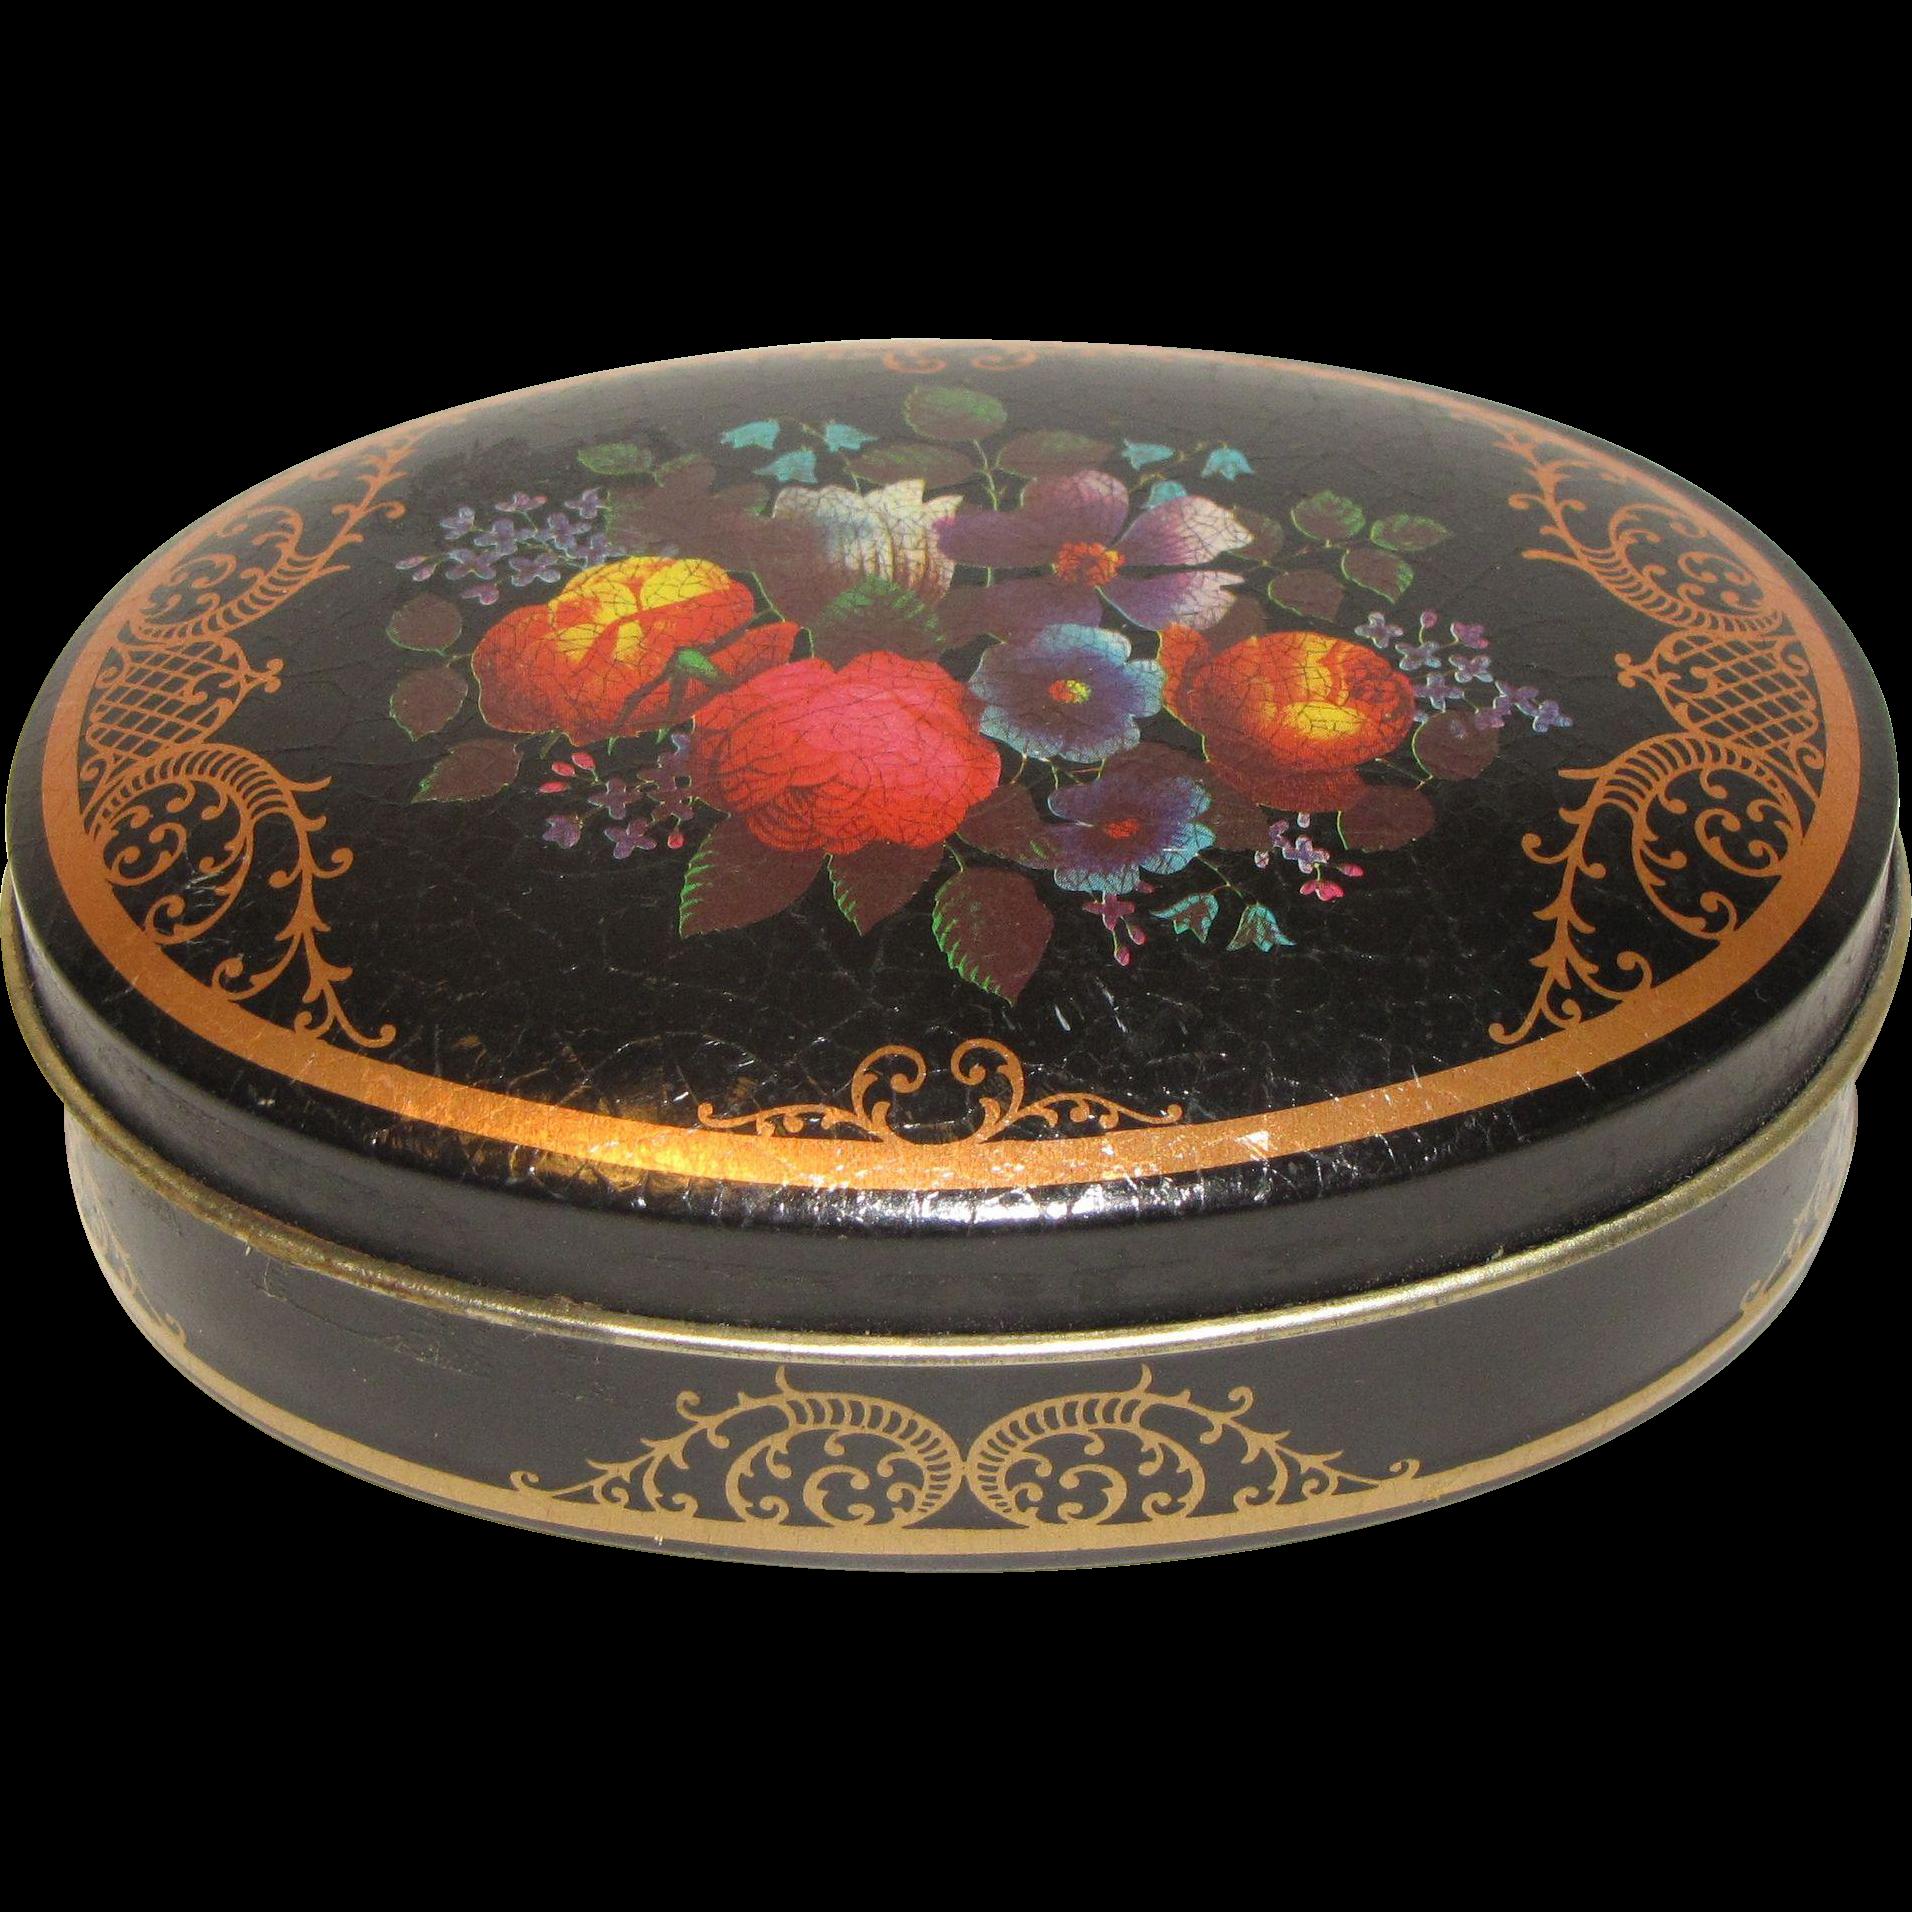 Very Small Vintage Toffee Tin, FARRAH'S Original Harrogate Toffee